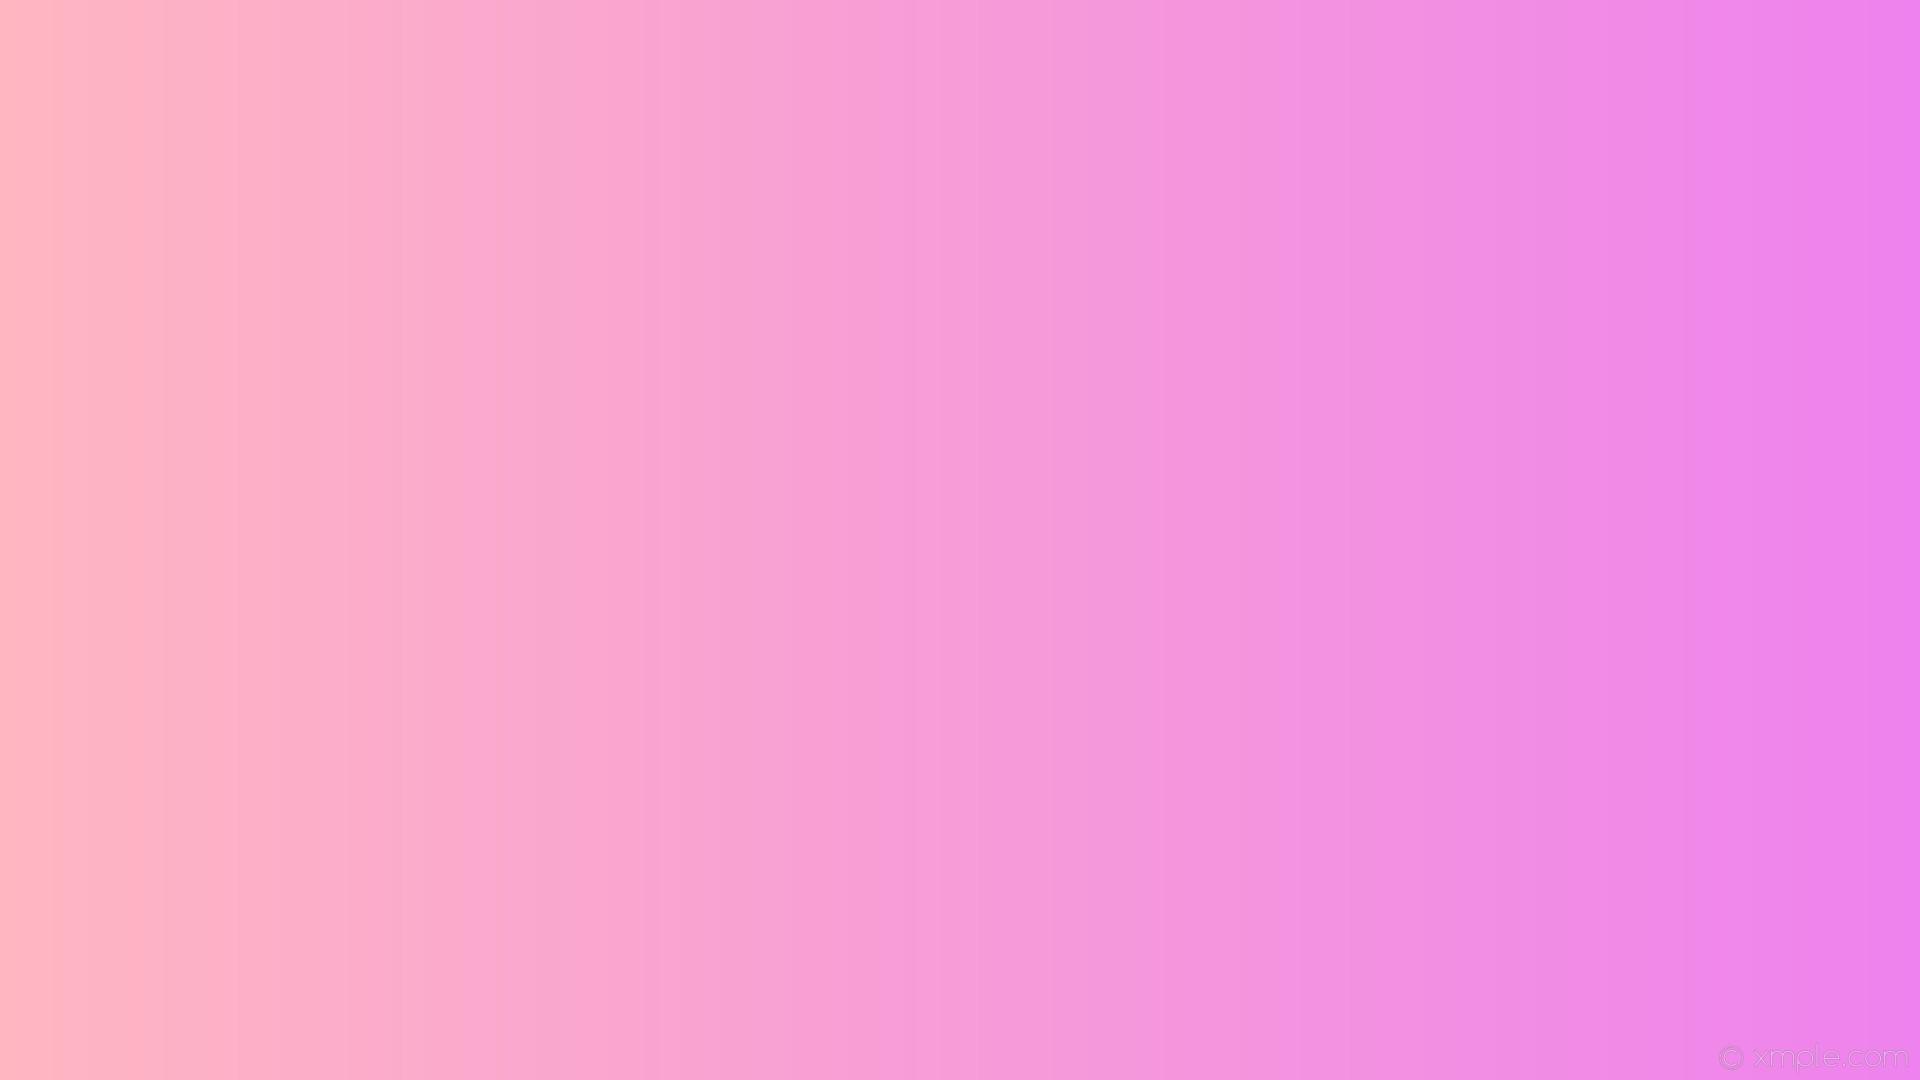 wallpaper pink linear purple gradient violet light pink #ee82ee #ffb6c1 0°